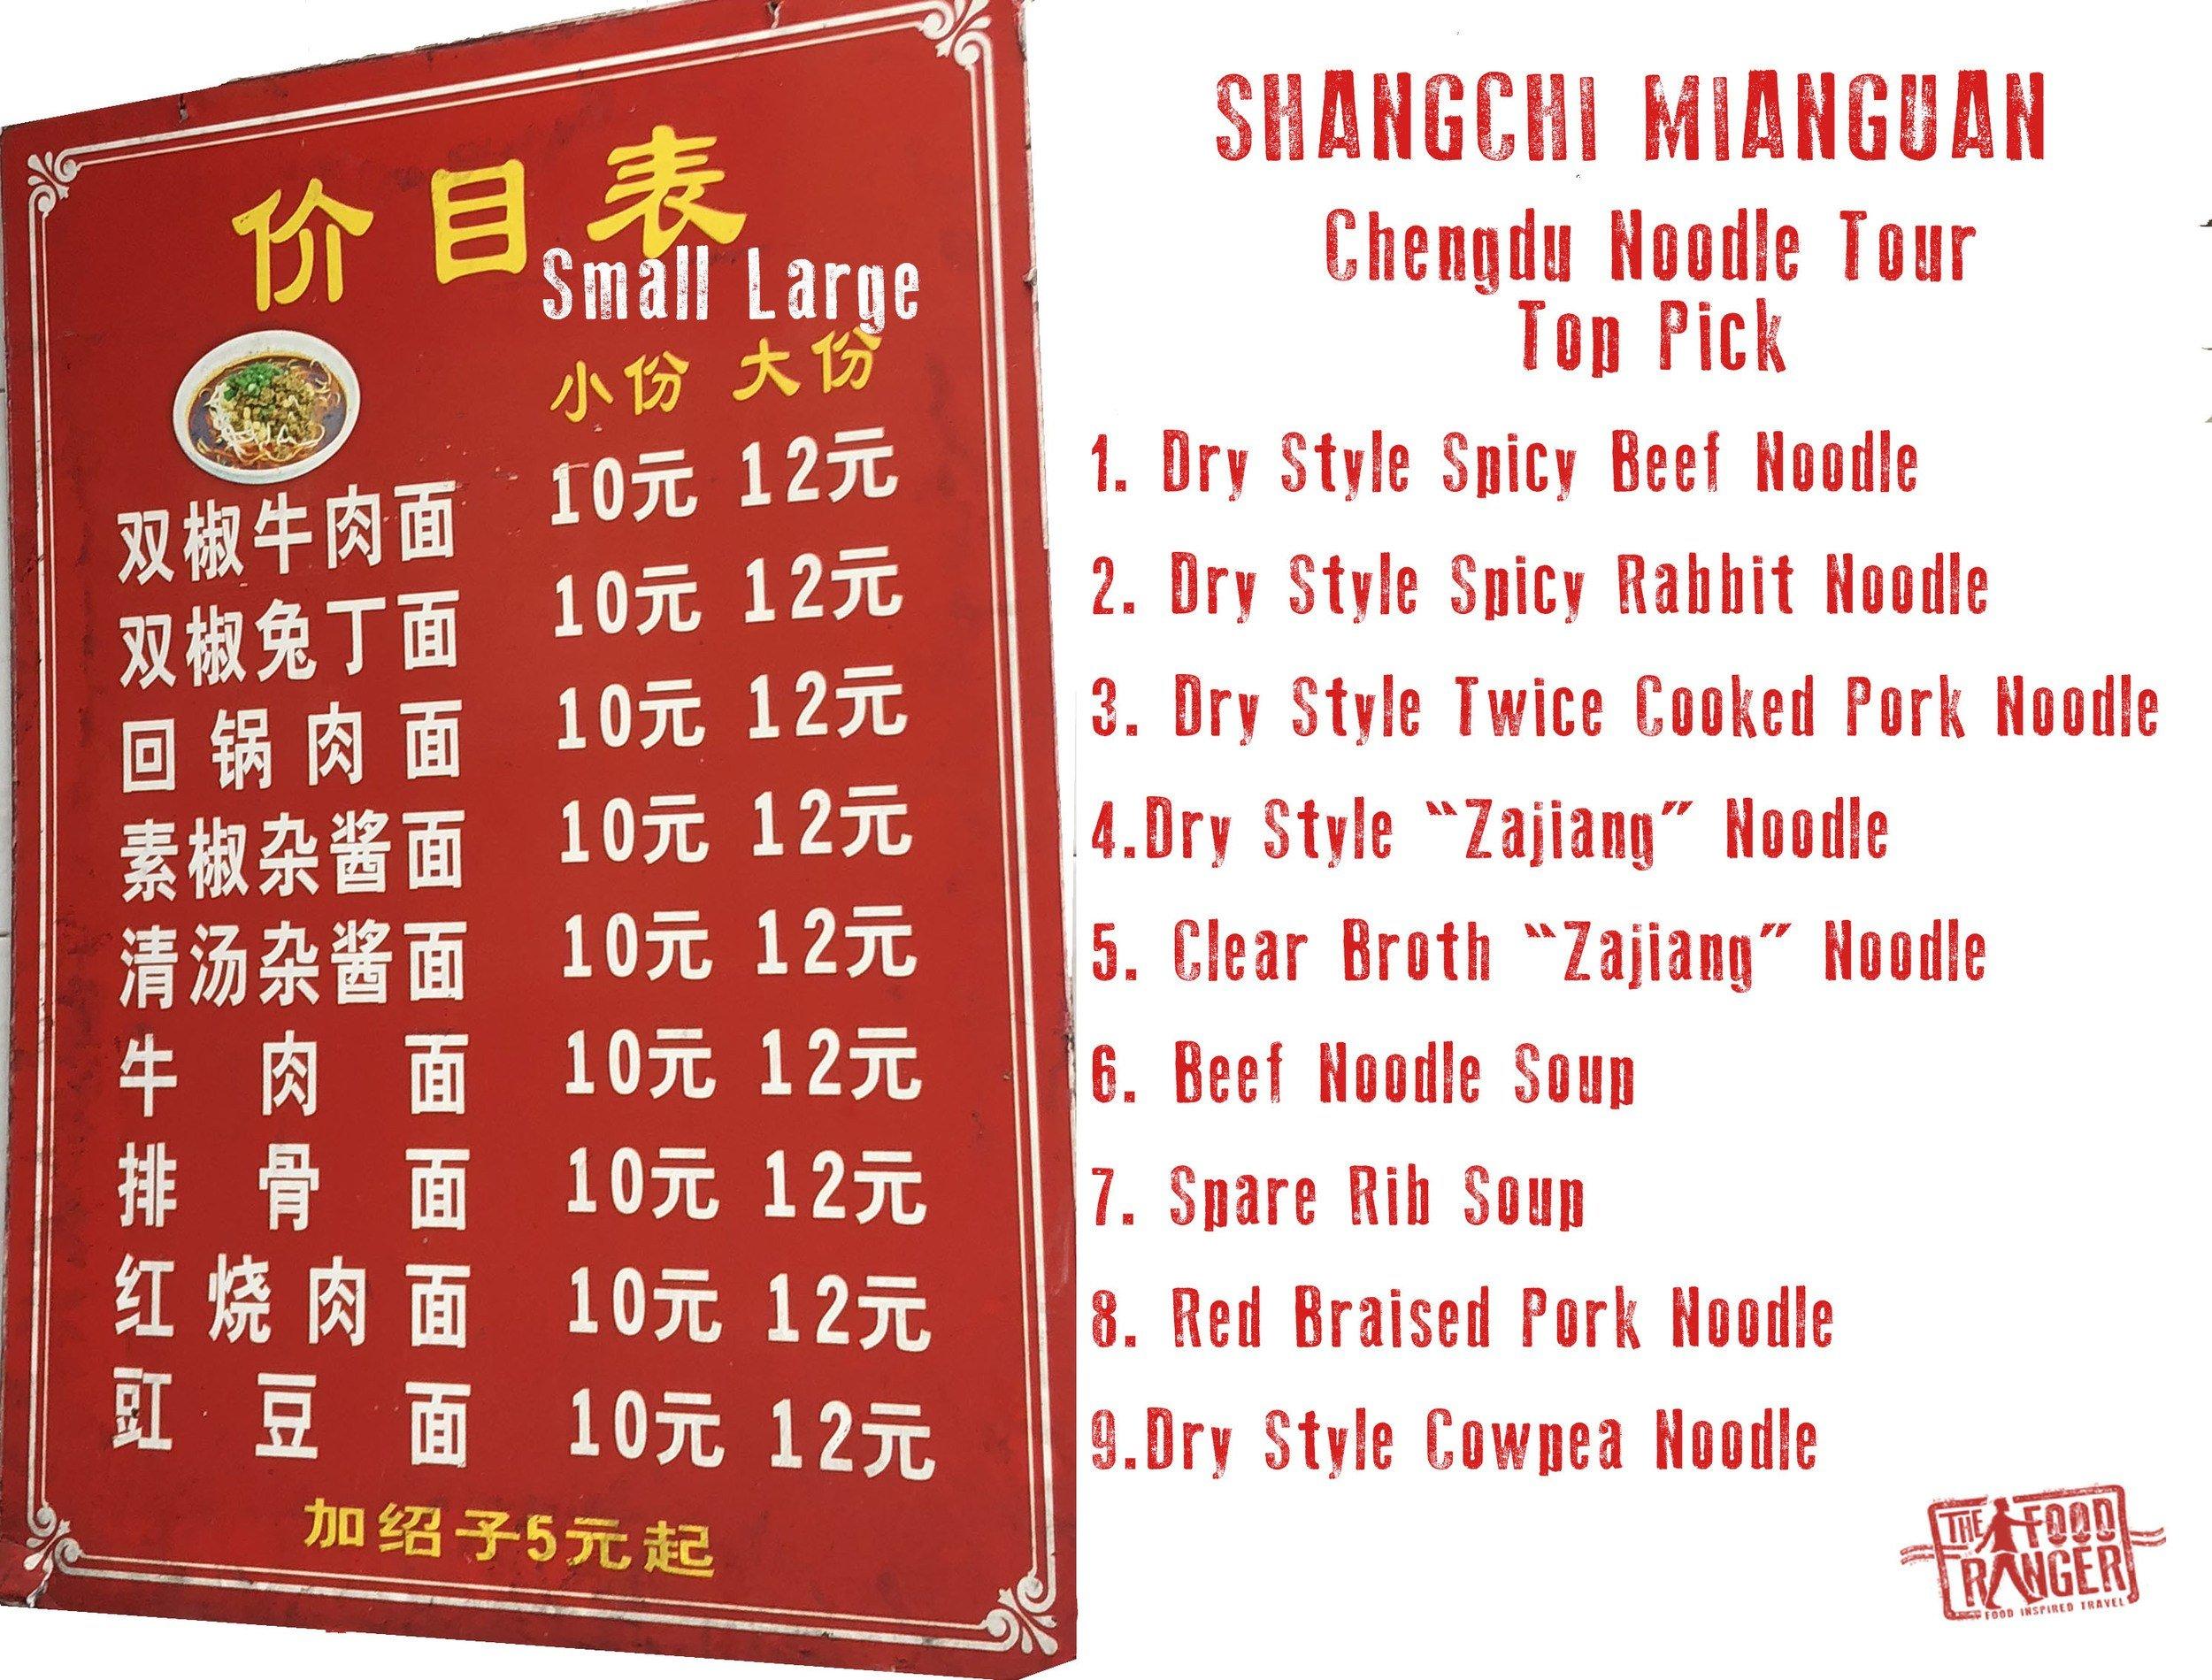 Shangchi mianguan noodle restaurant translated menu